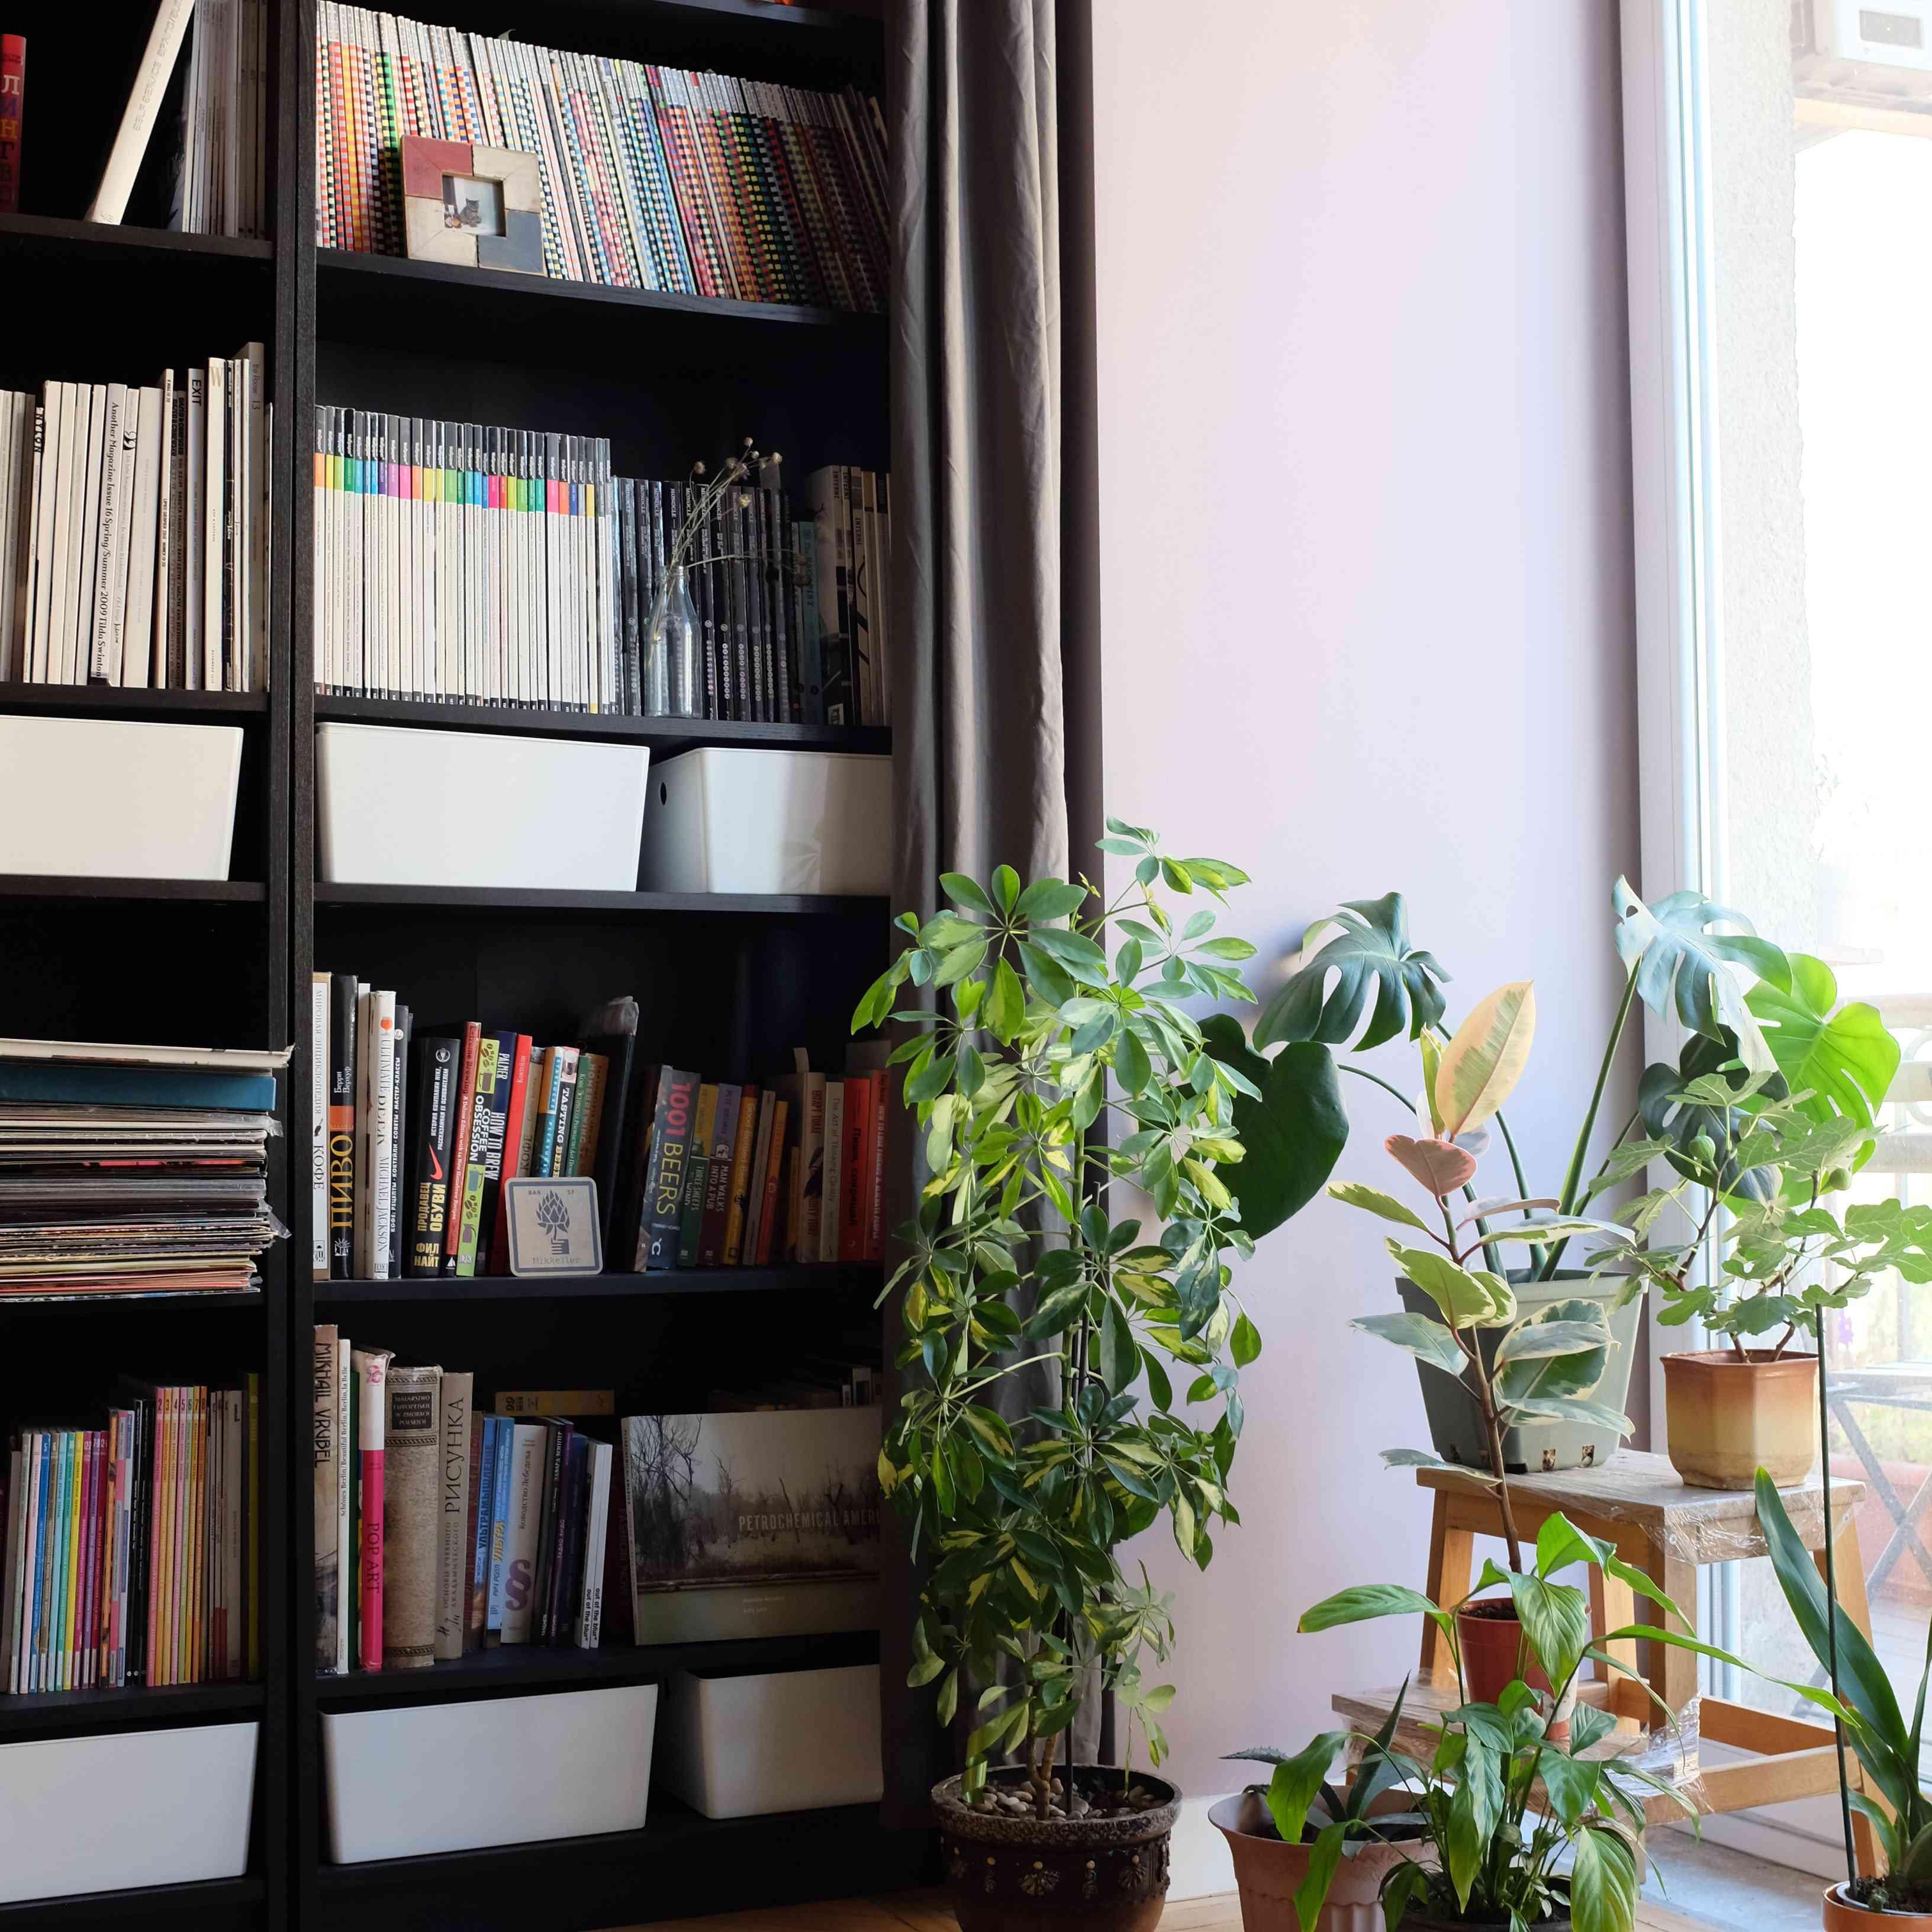 plants and magazines on a bookshelf